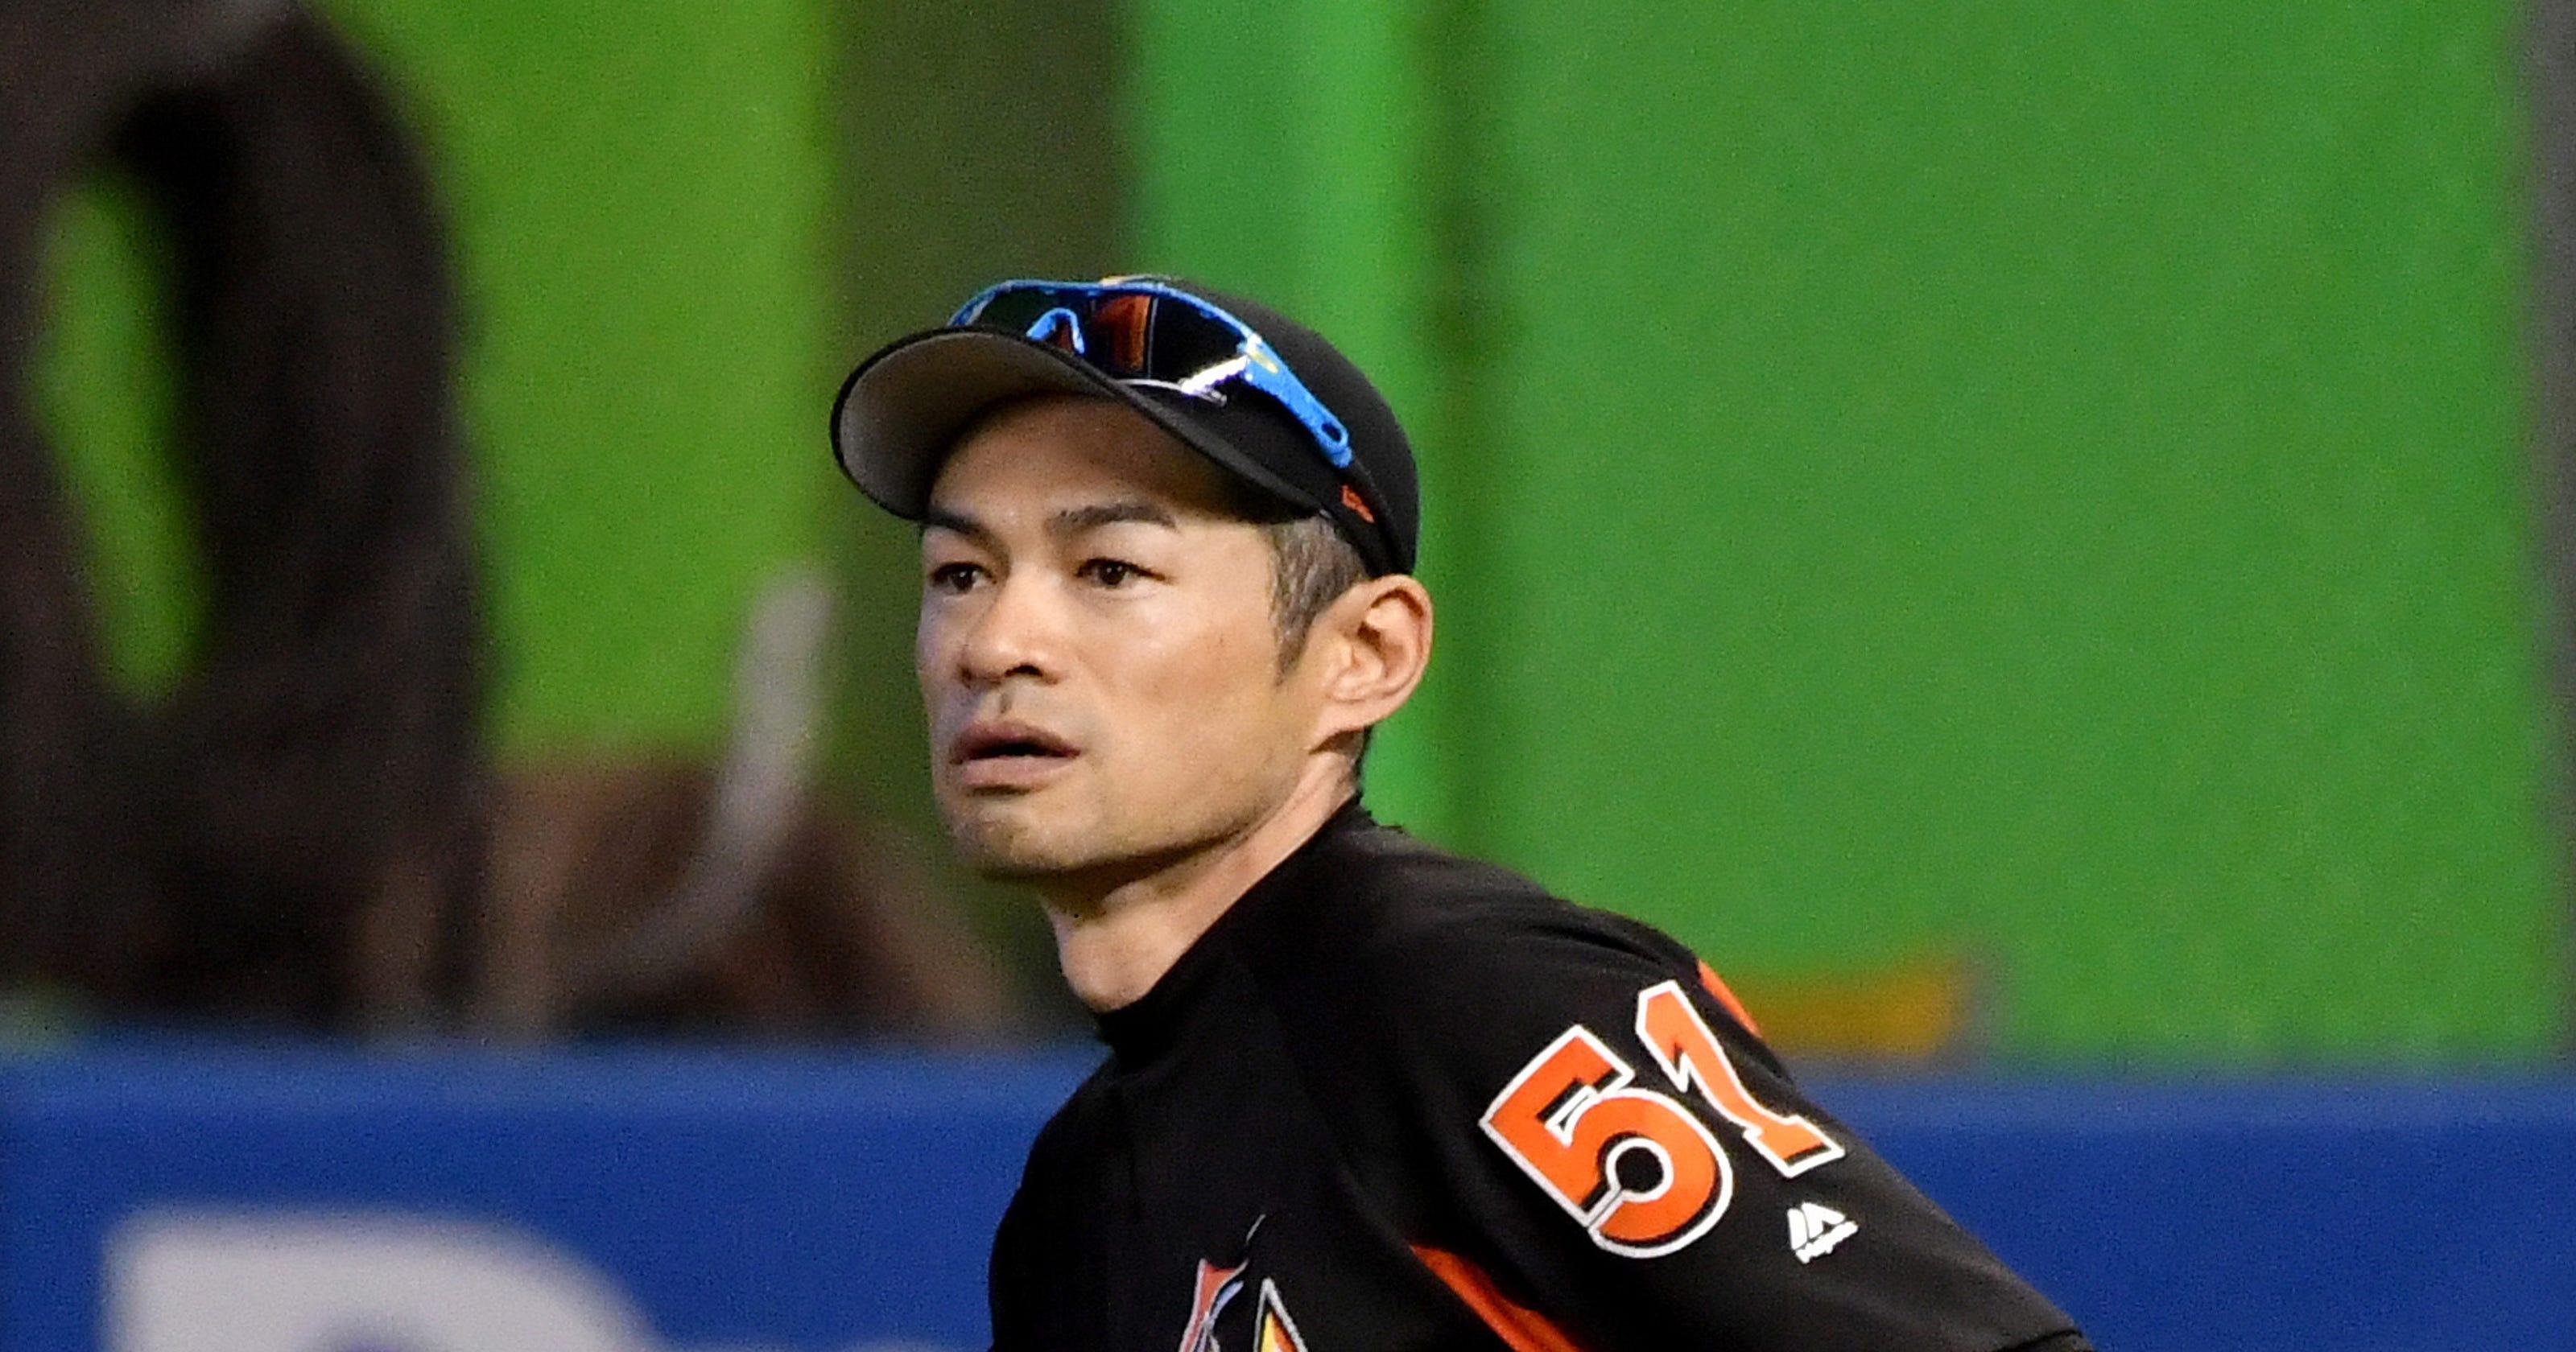 Ichiro Suzuki, 44, Mariners near agreet on contract